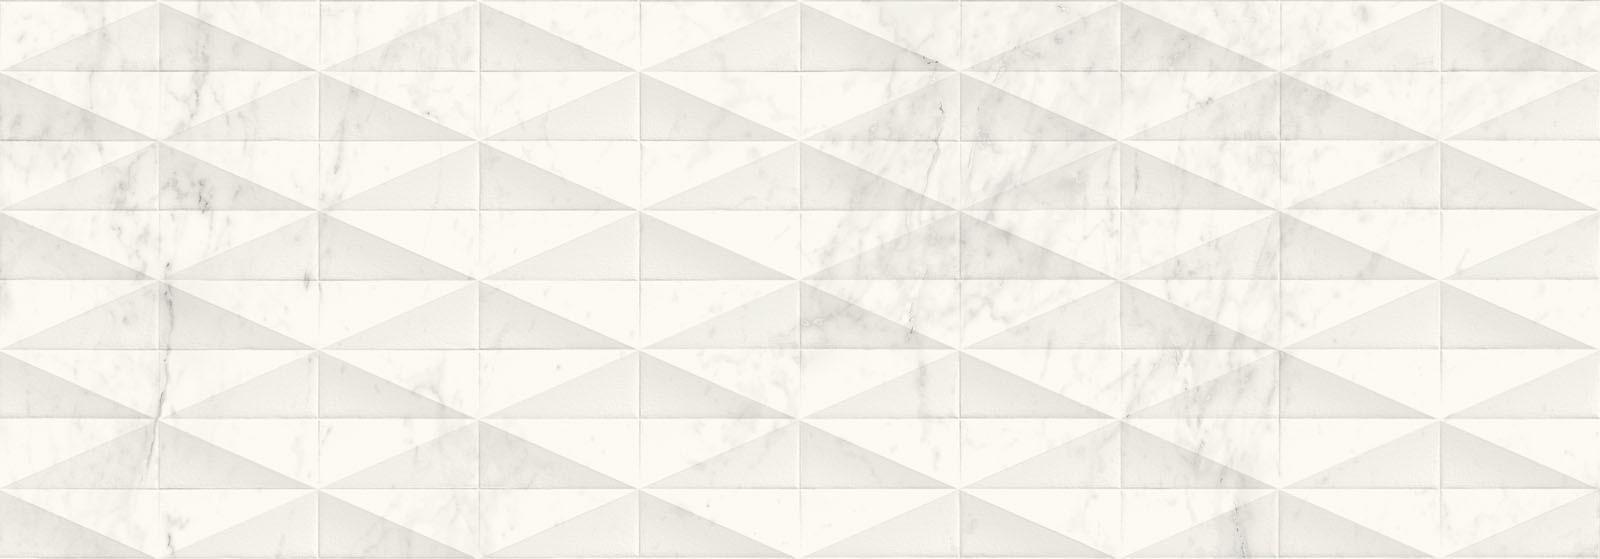 Стенни плочки Allmarble Wall Altissimo Struttura Pave 3D Satin 40x120